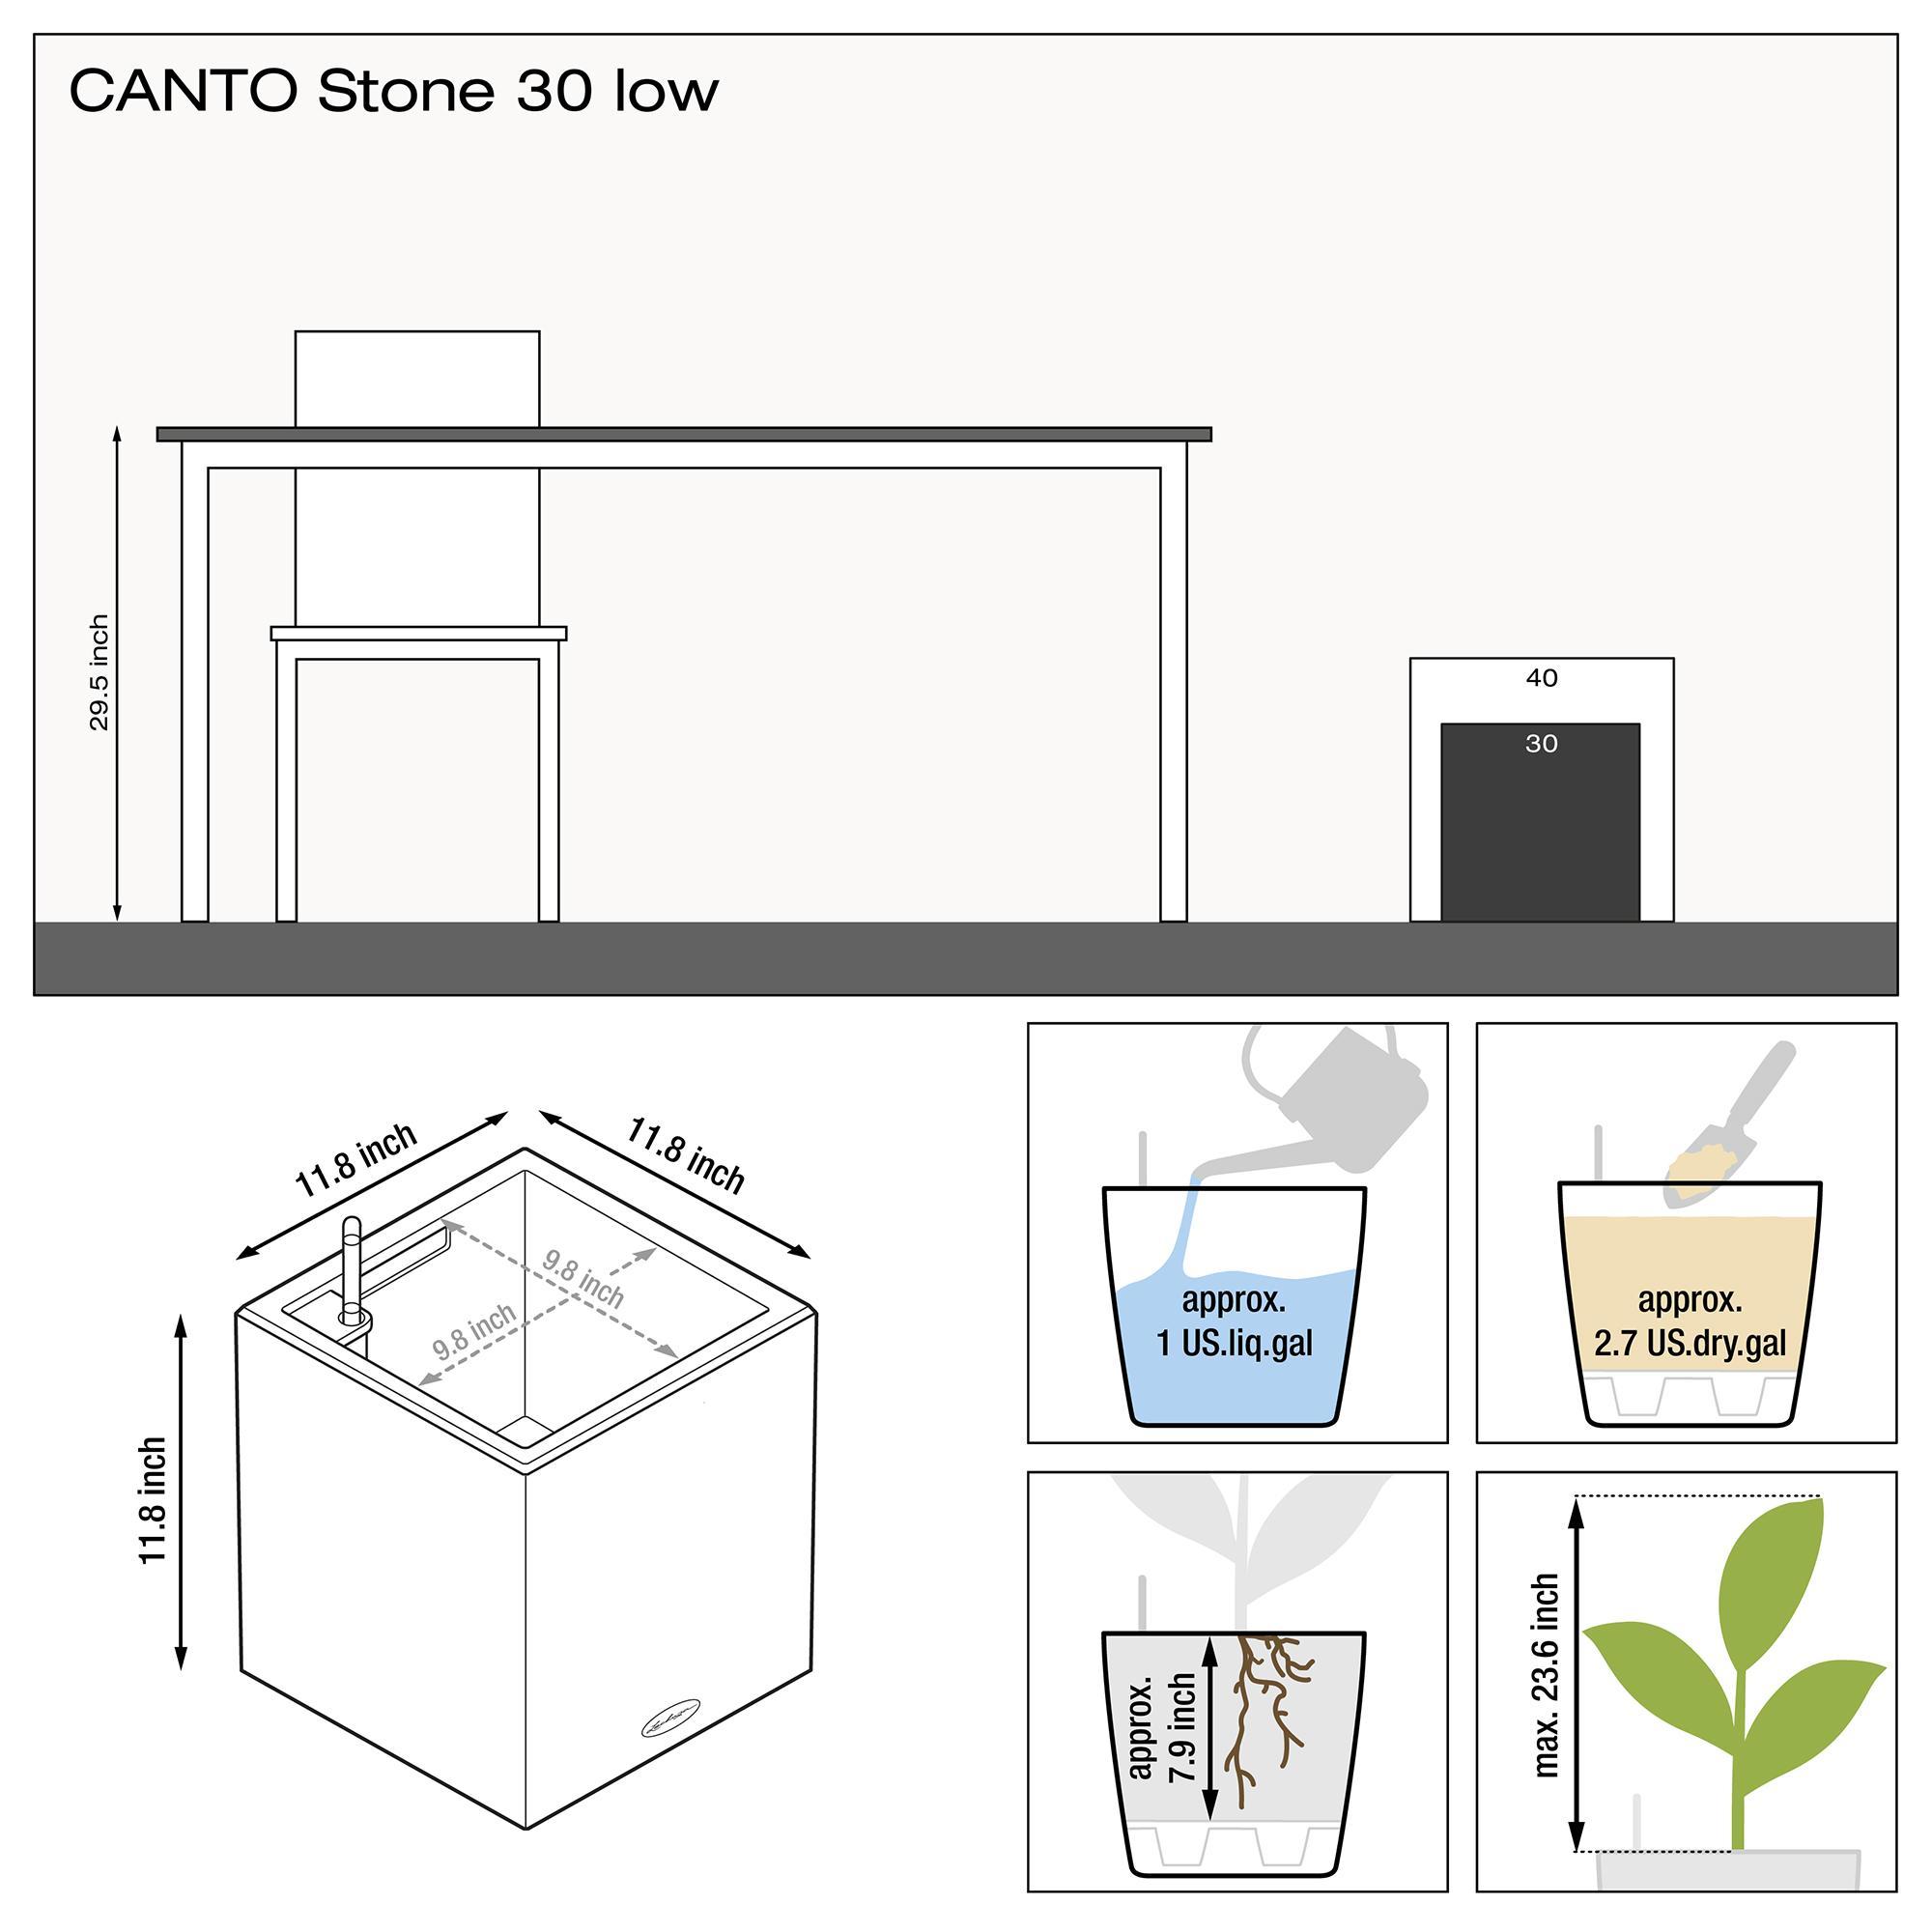 le_canto-stone-wuerfel30_product_addi_nz_us